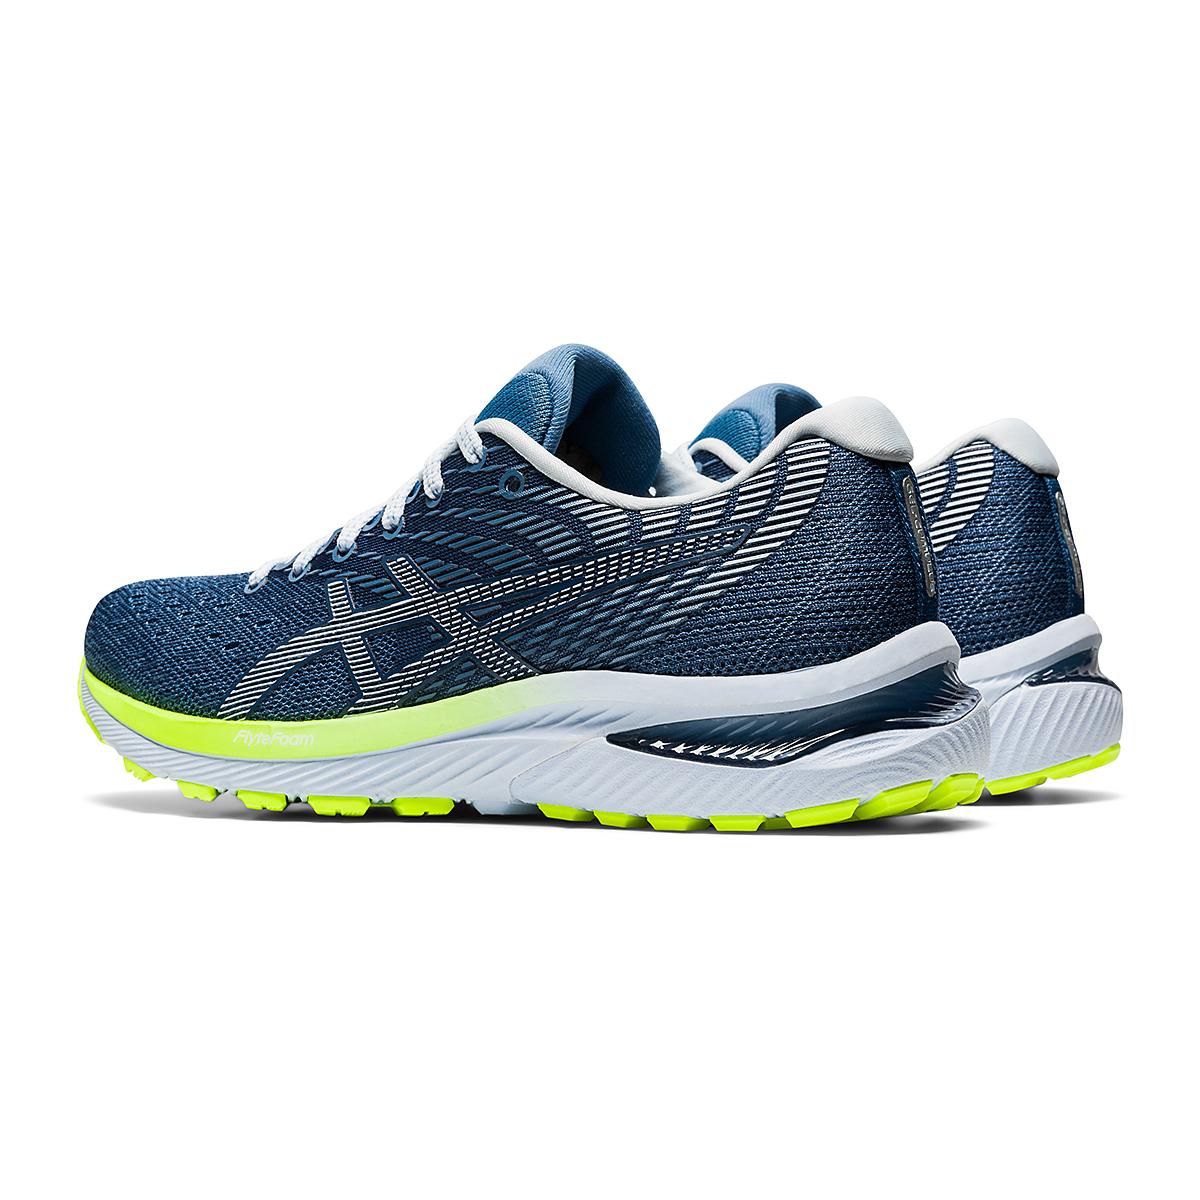 Women's Asics GEL-Cumulus 22 Running Shoe - Color: Grey Floss/White - Size: 6 - Width: Regular, Grey Floss/White, large, image 4